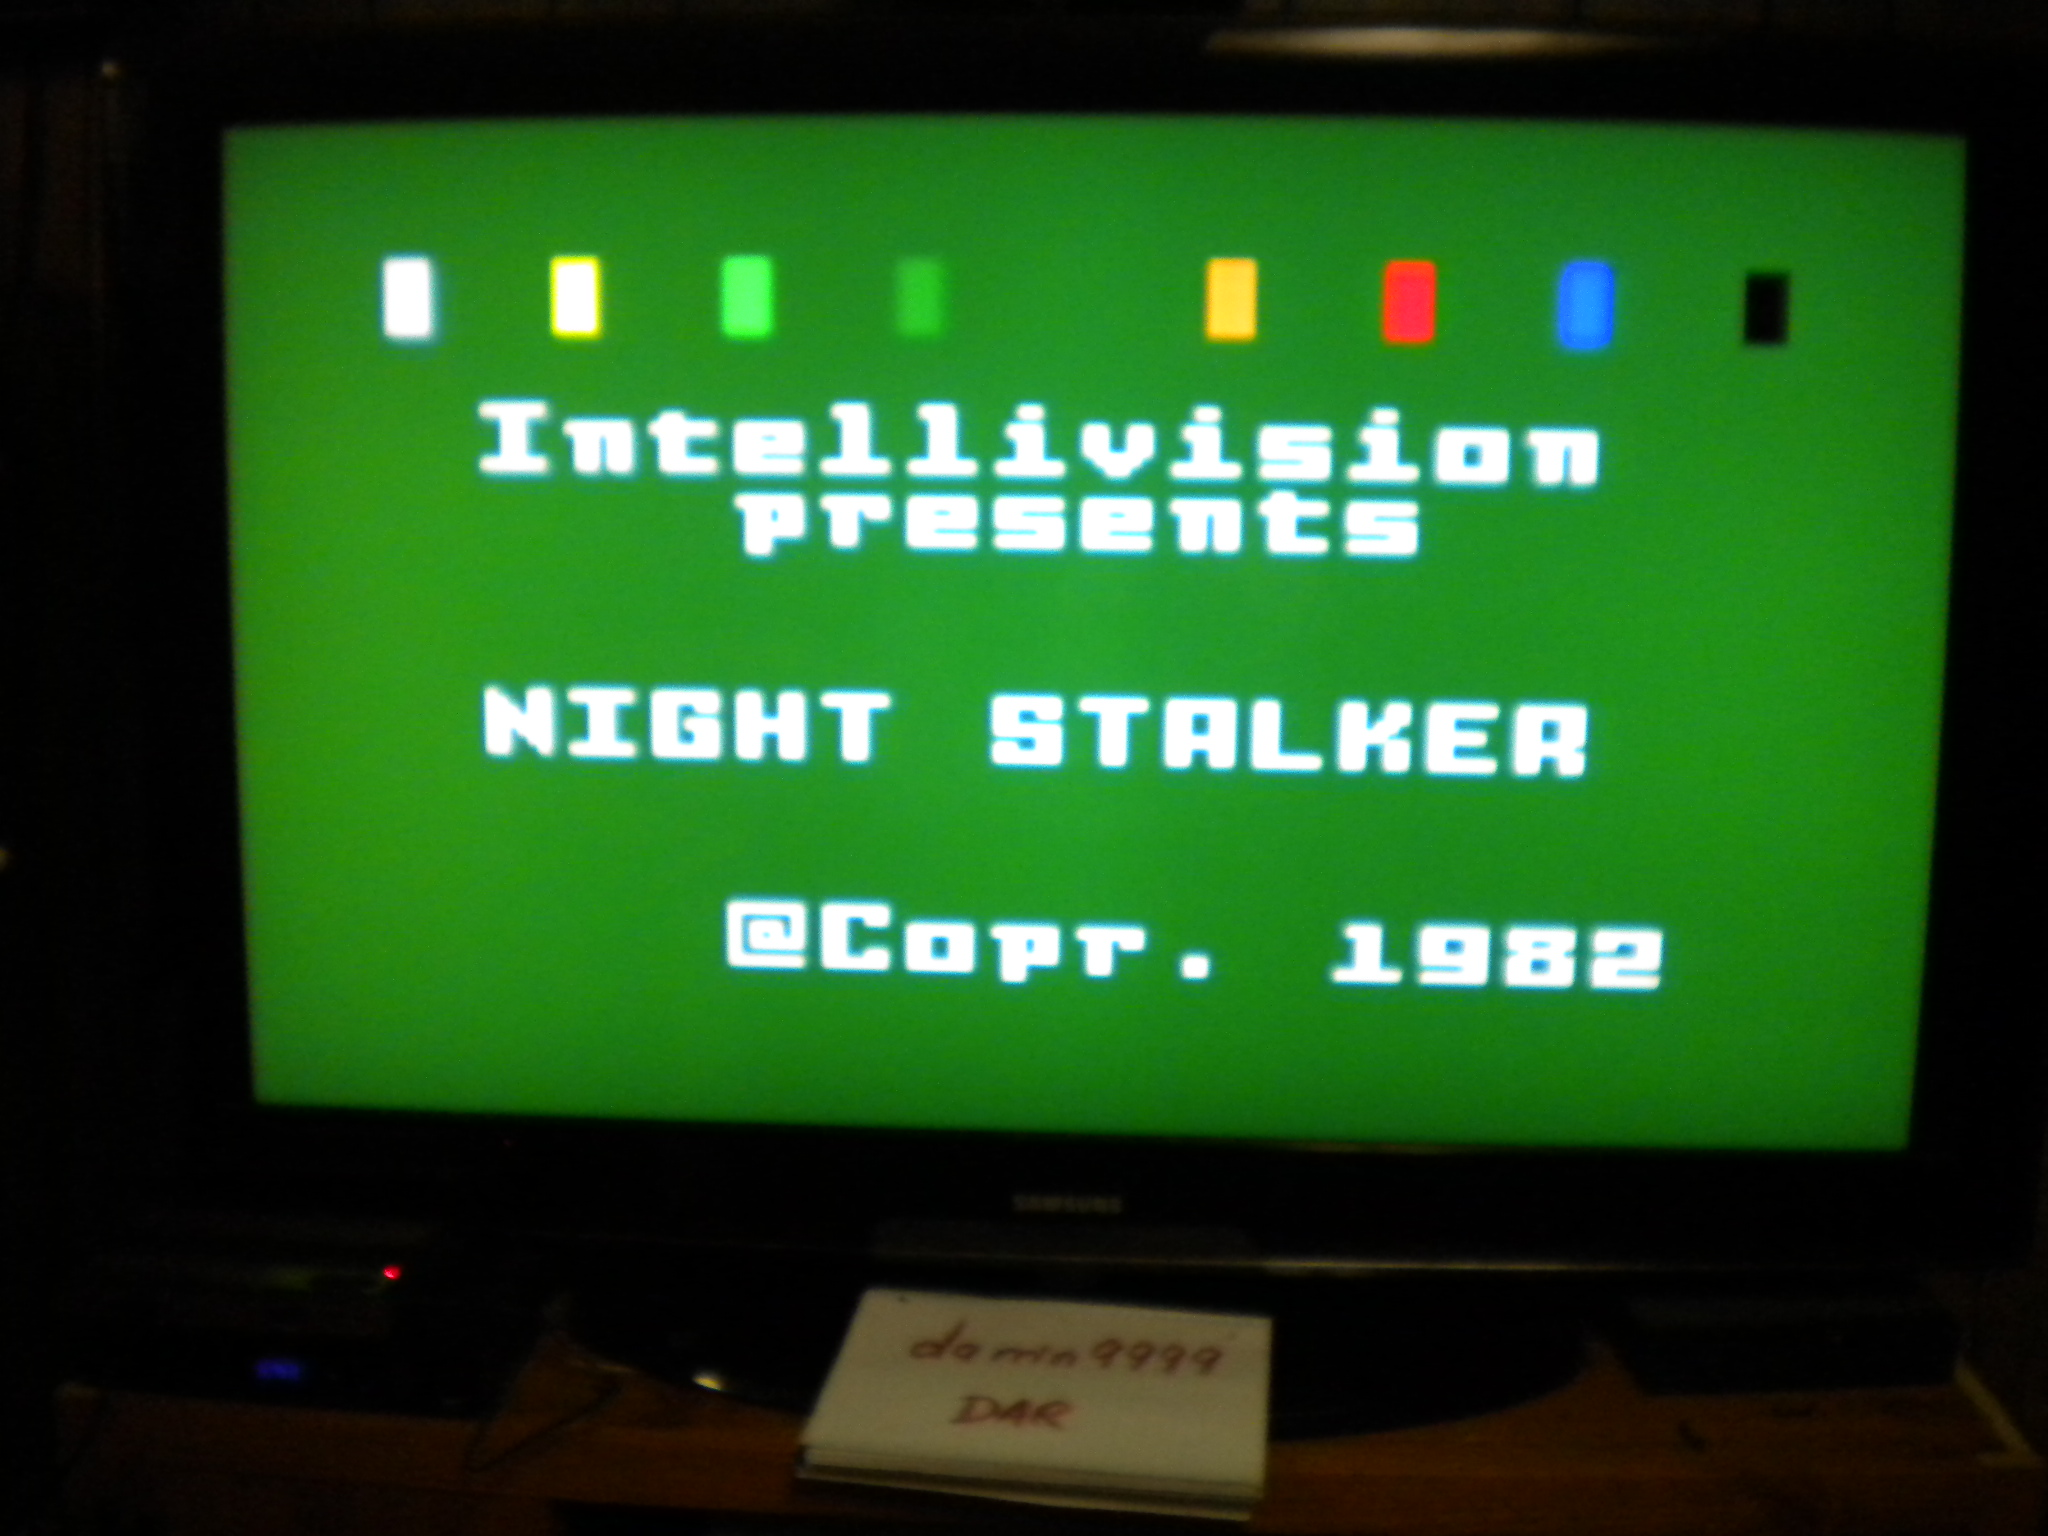 Nightstalker 7,700 points